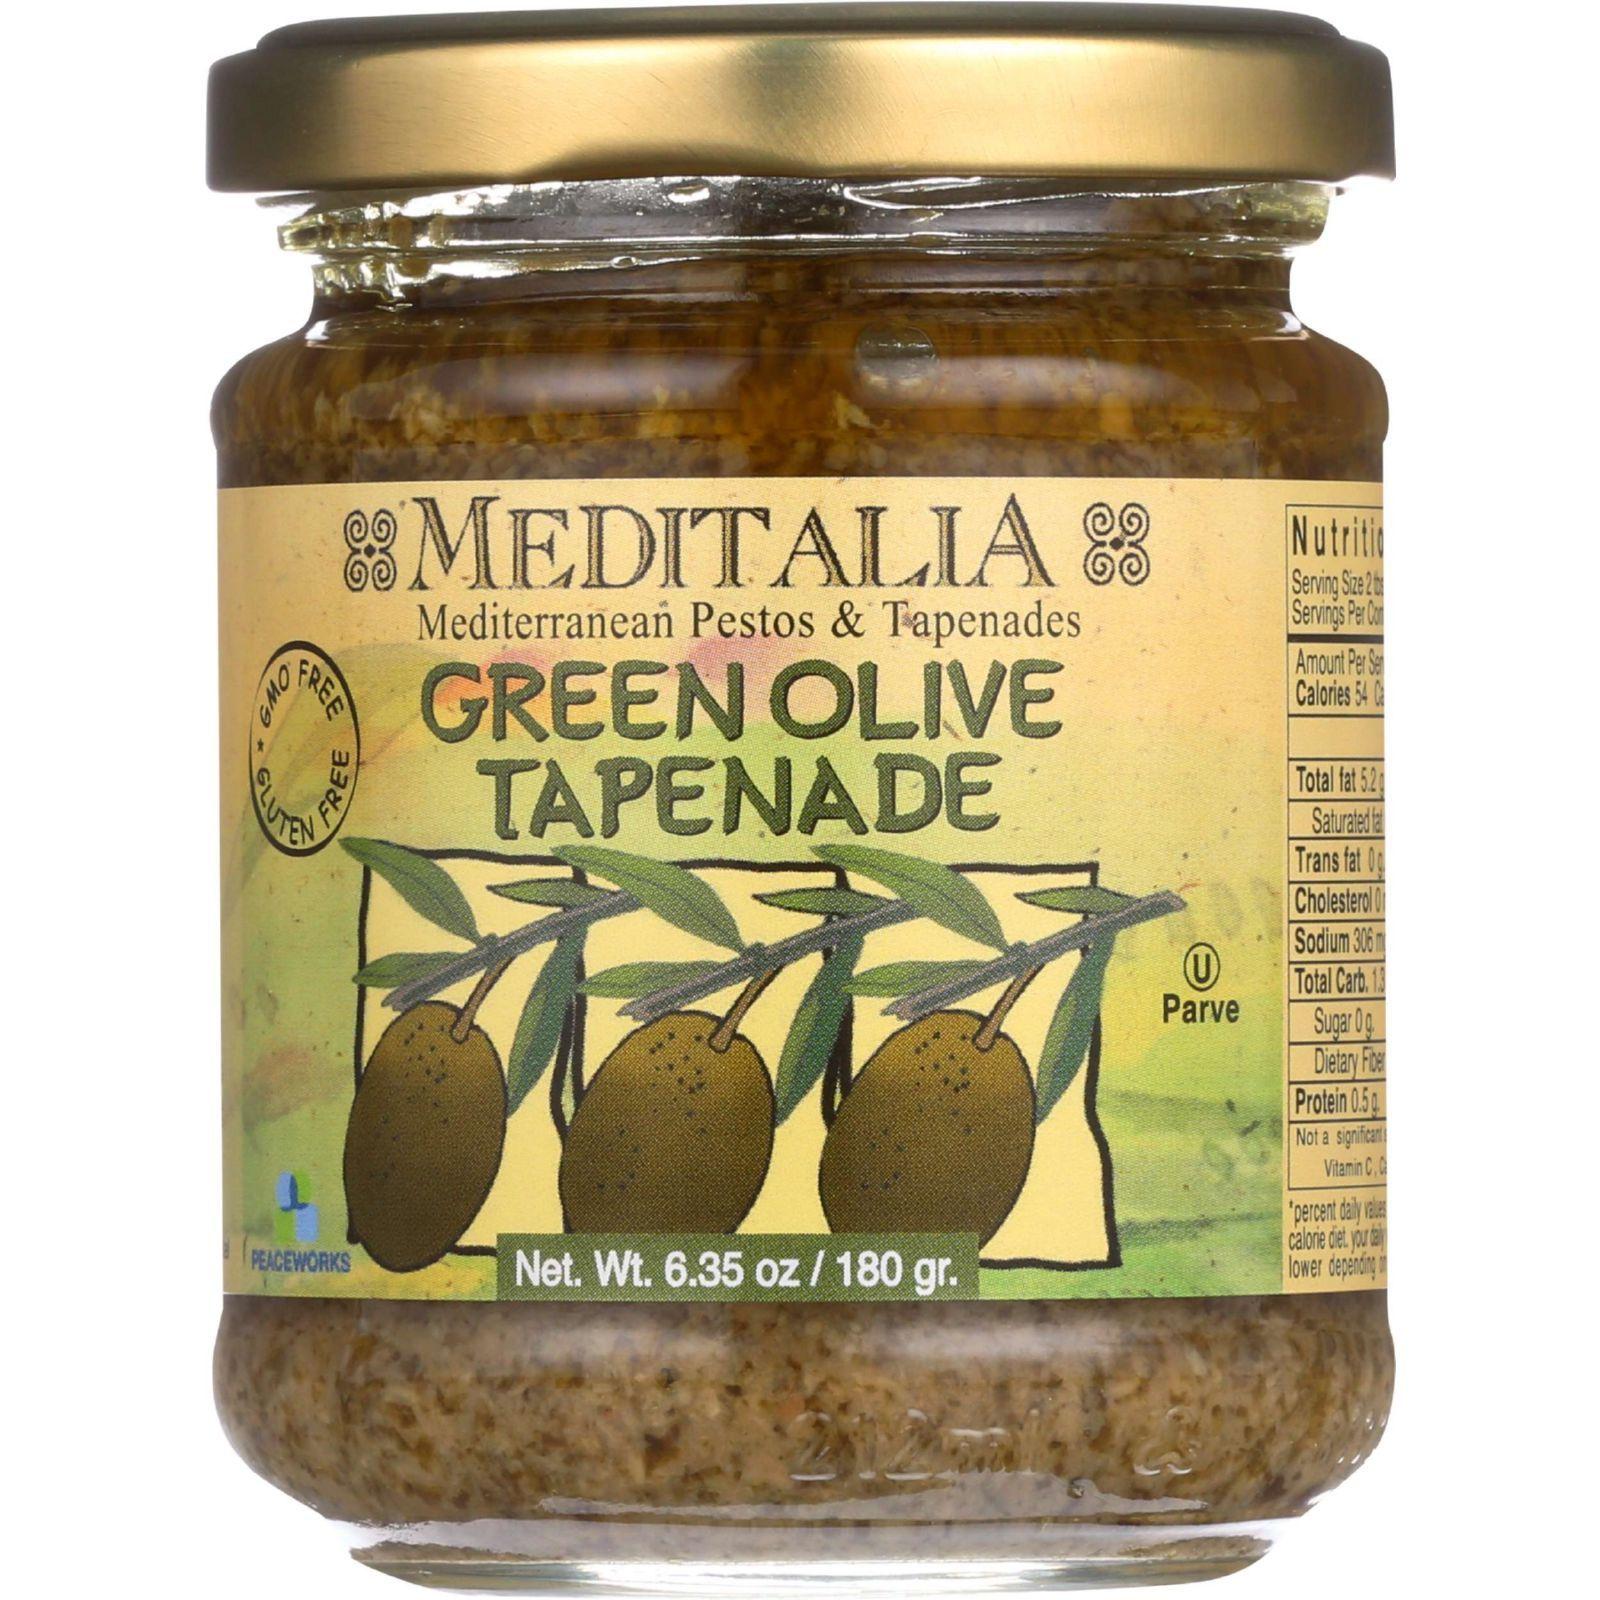 Meditalia Tapenade Spread - Green Olive - Case of 6 - 6.35 oz